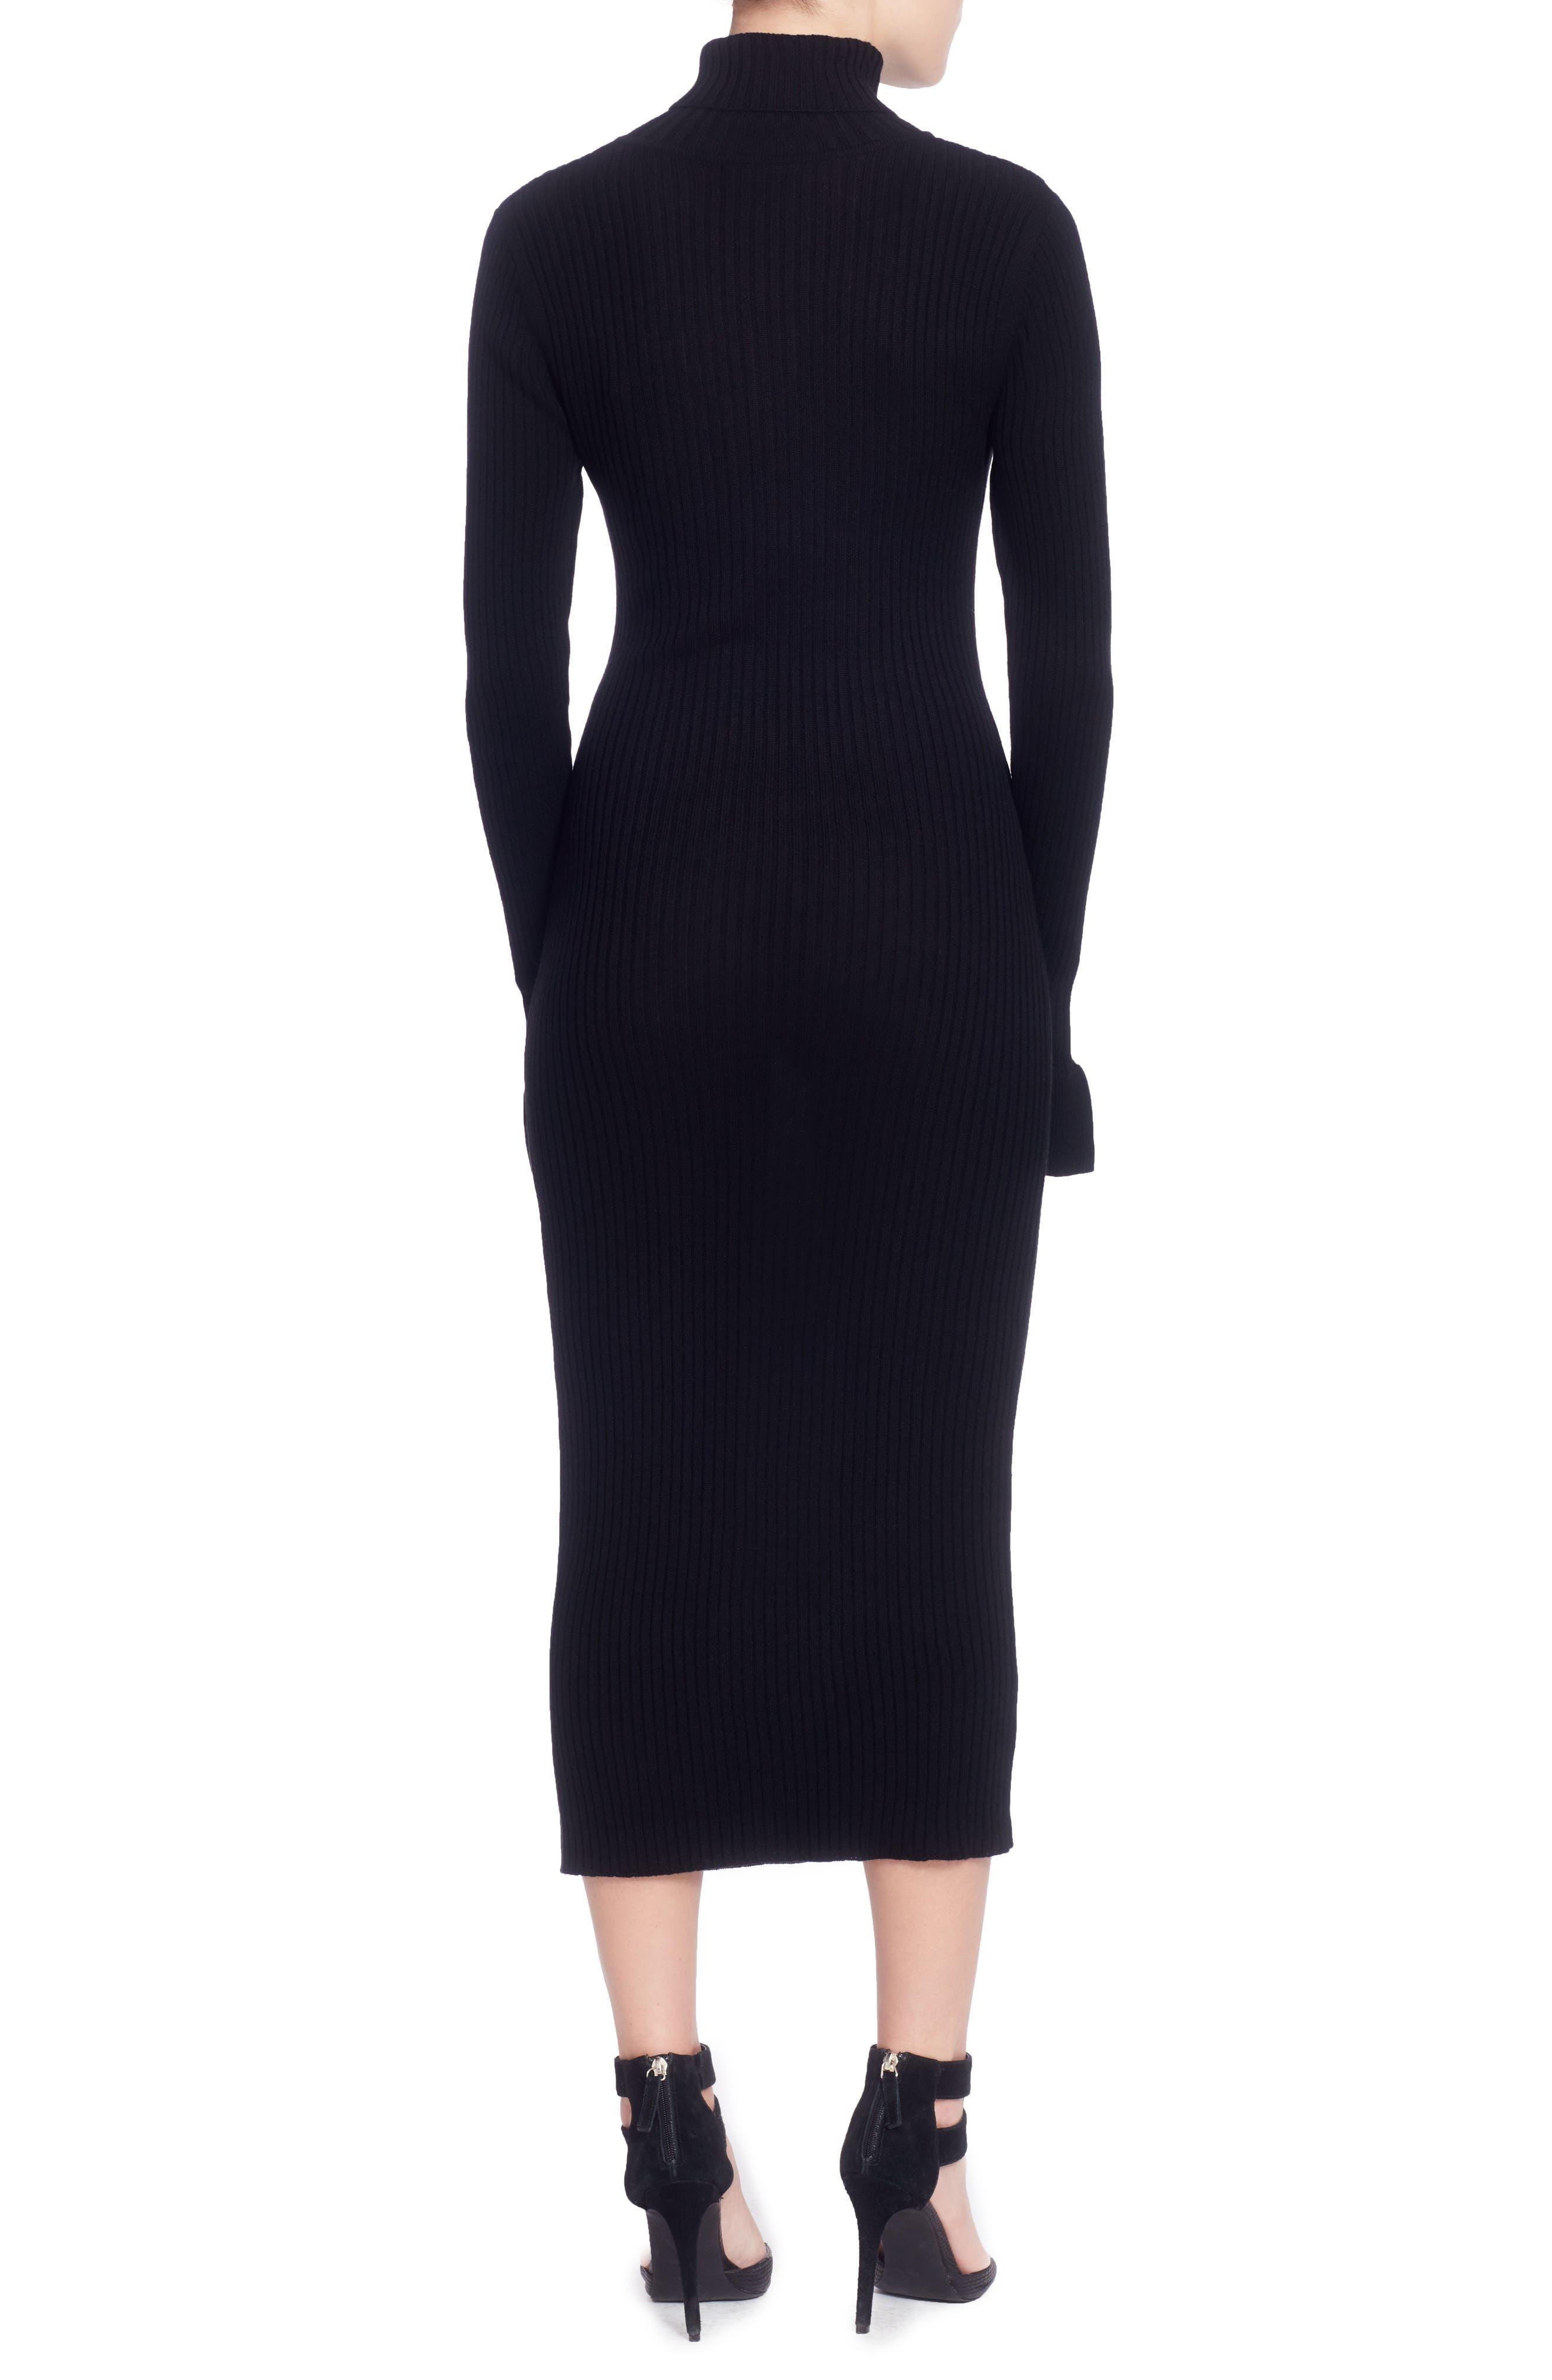 Camron Turtleneck Midi Dress,                             Alternate thumbnail 2, color,                             Black